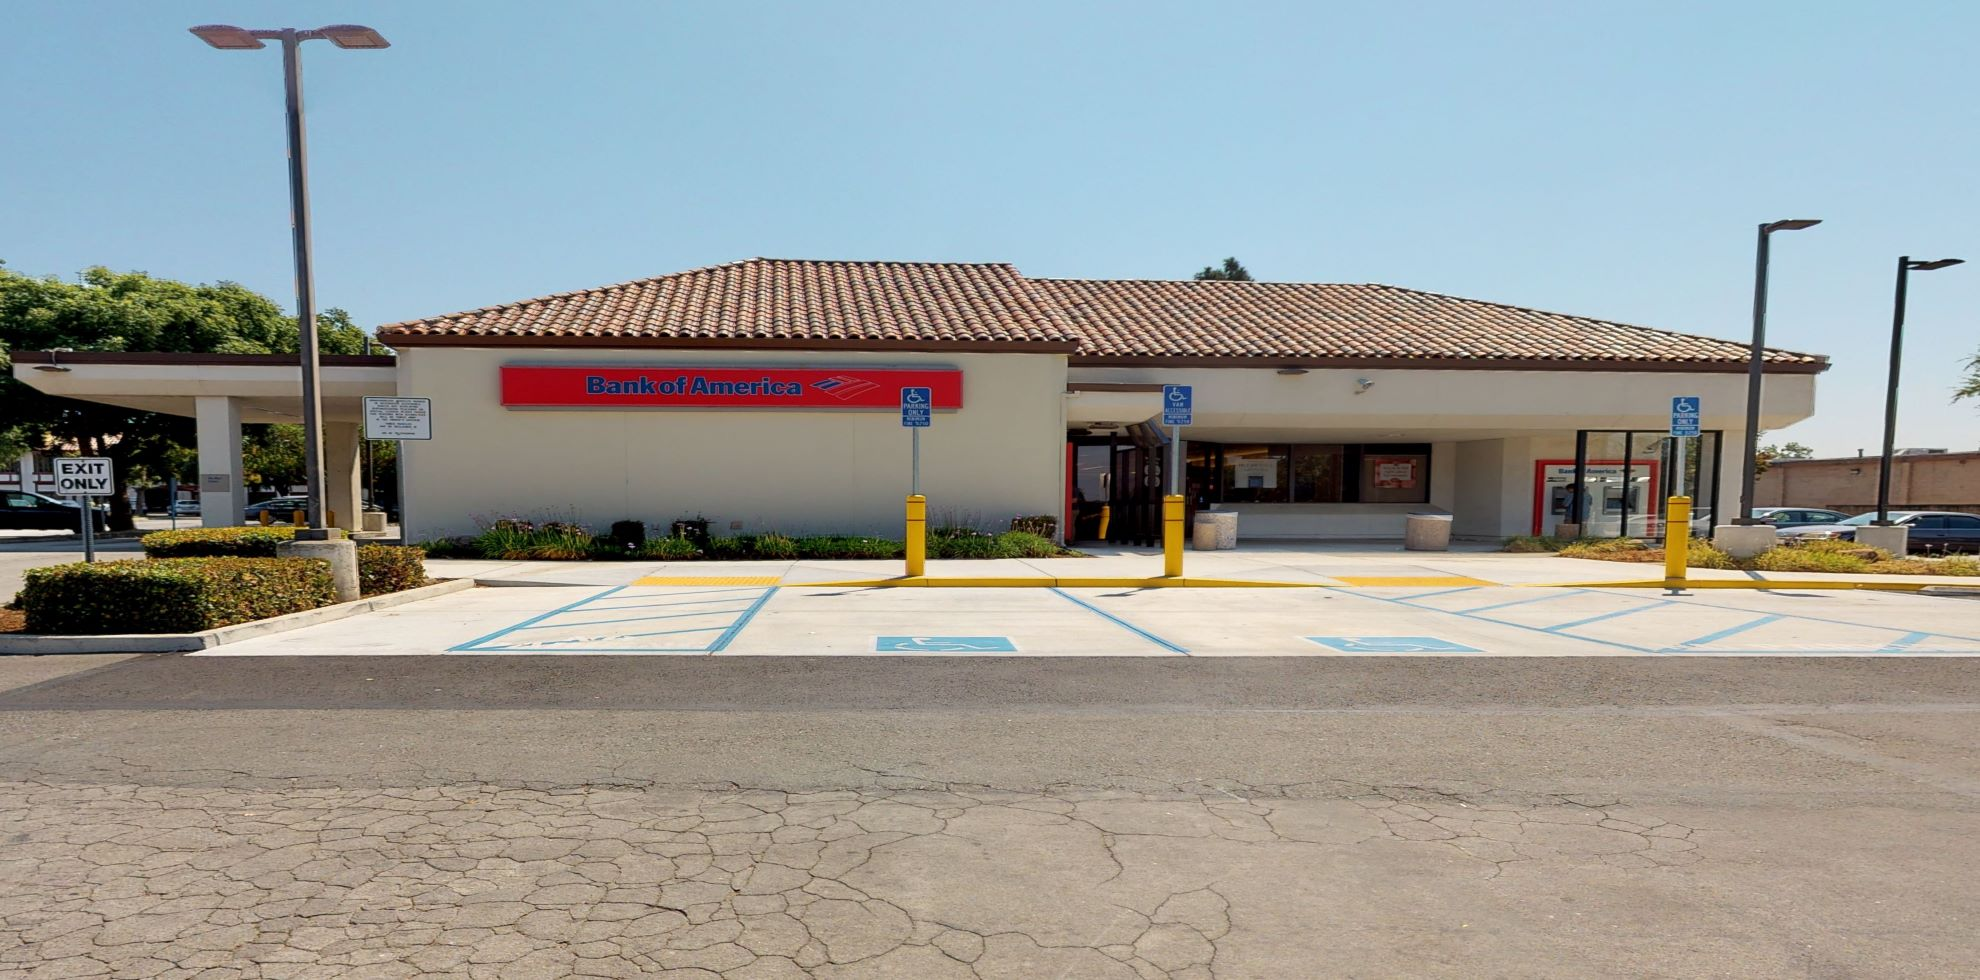 Bank of America financial center with drive-thru ATM | 2650 Berryessa Rd, San Jose, CA 95132